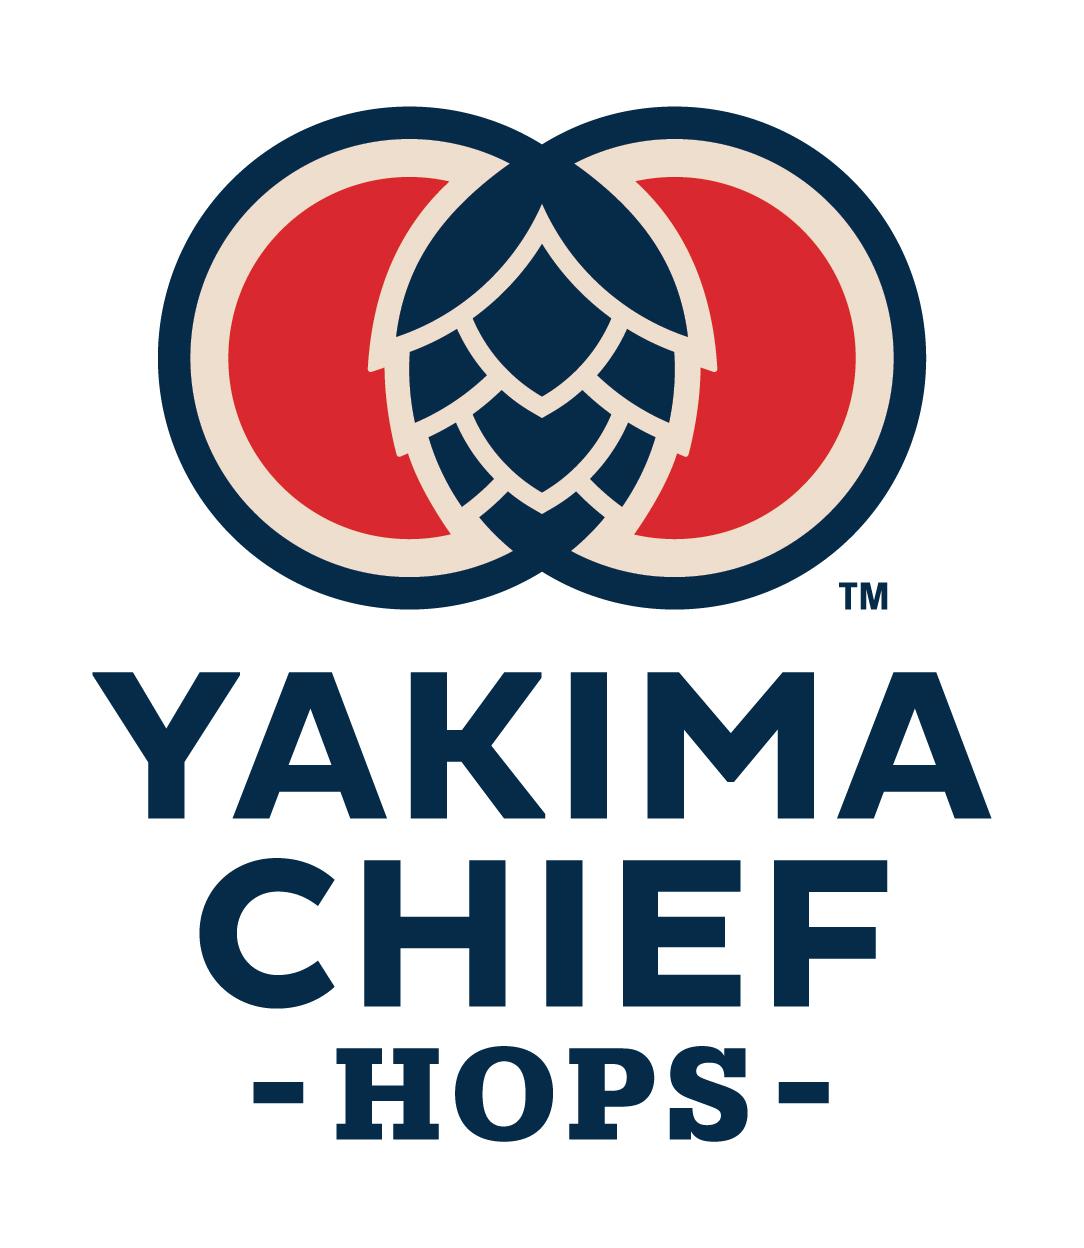 YakimaChief_Master_Logo_Stacked.jpg